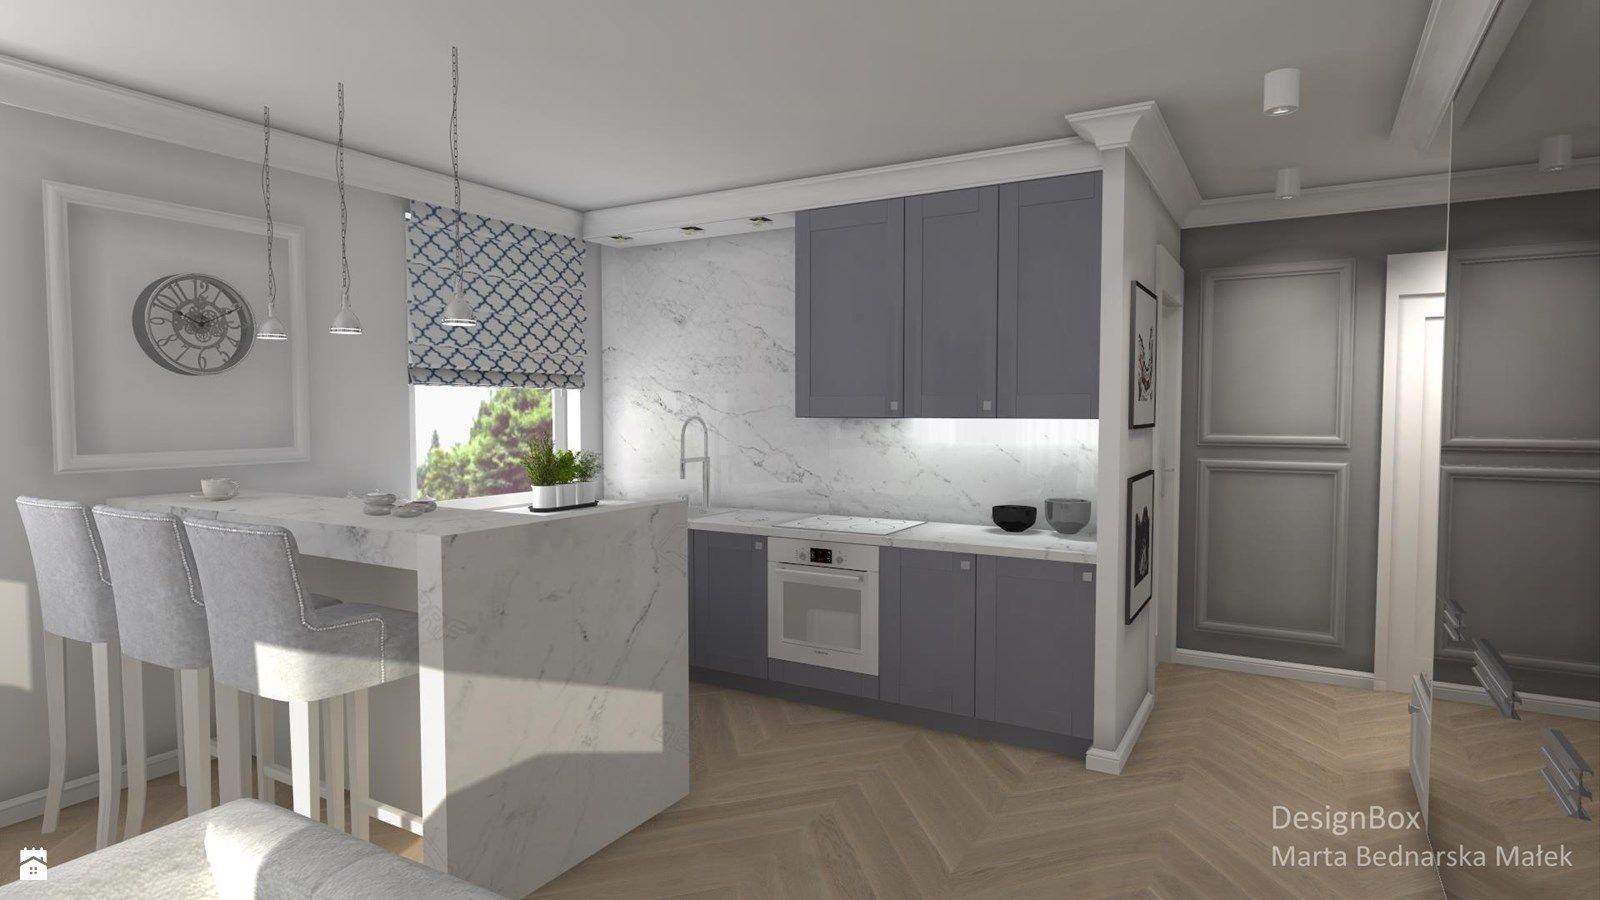 kuchnia styl nowojorski zdja cie od designbox marta bednarska maa ek